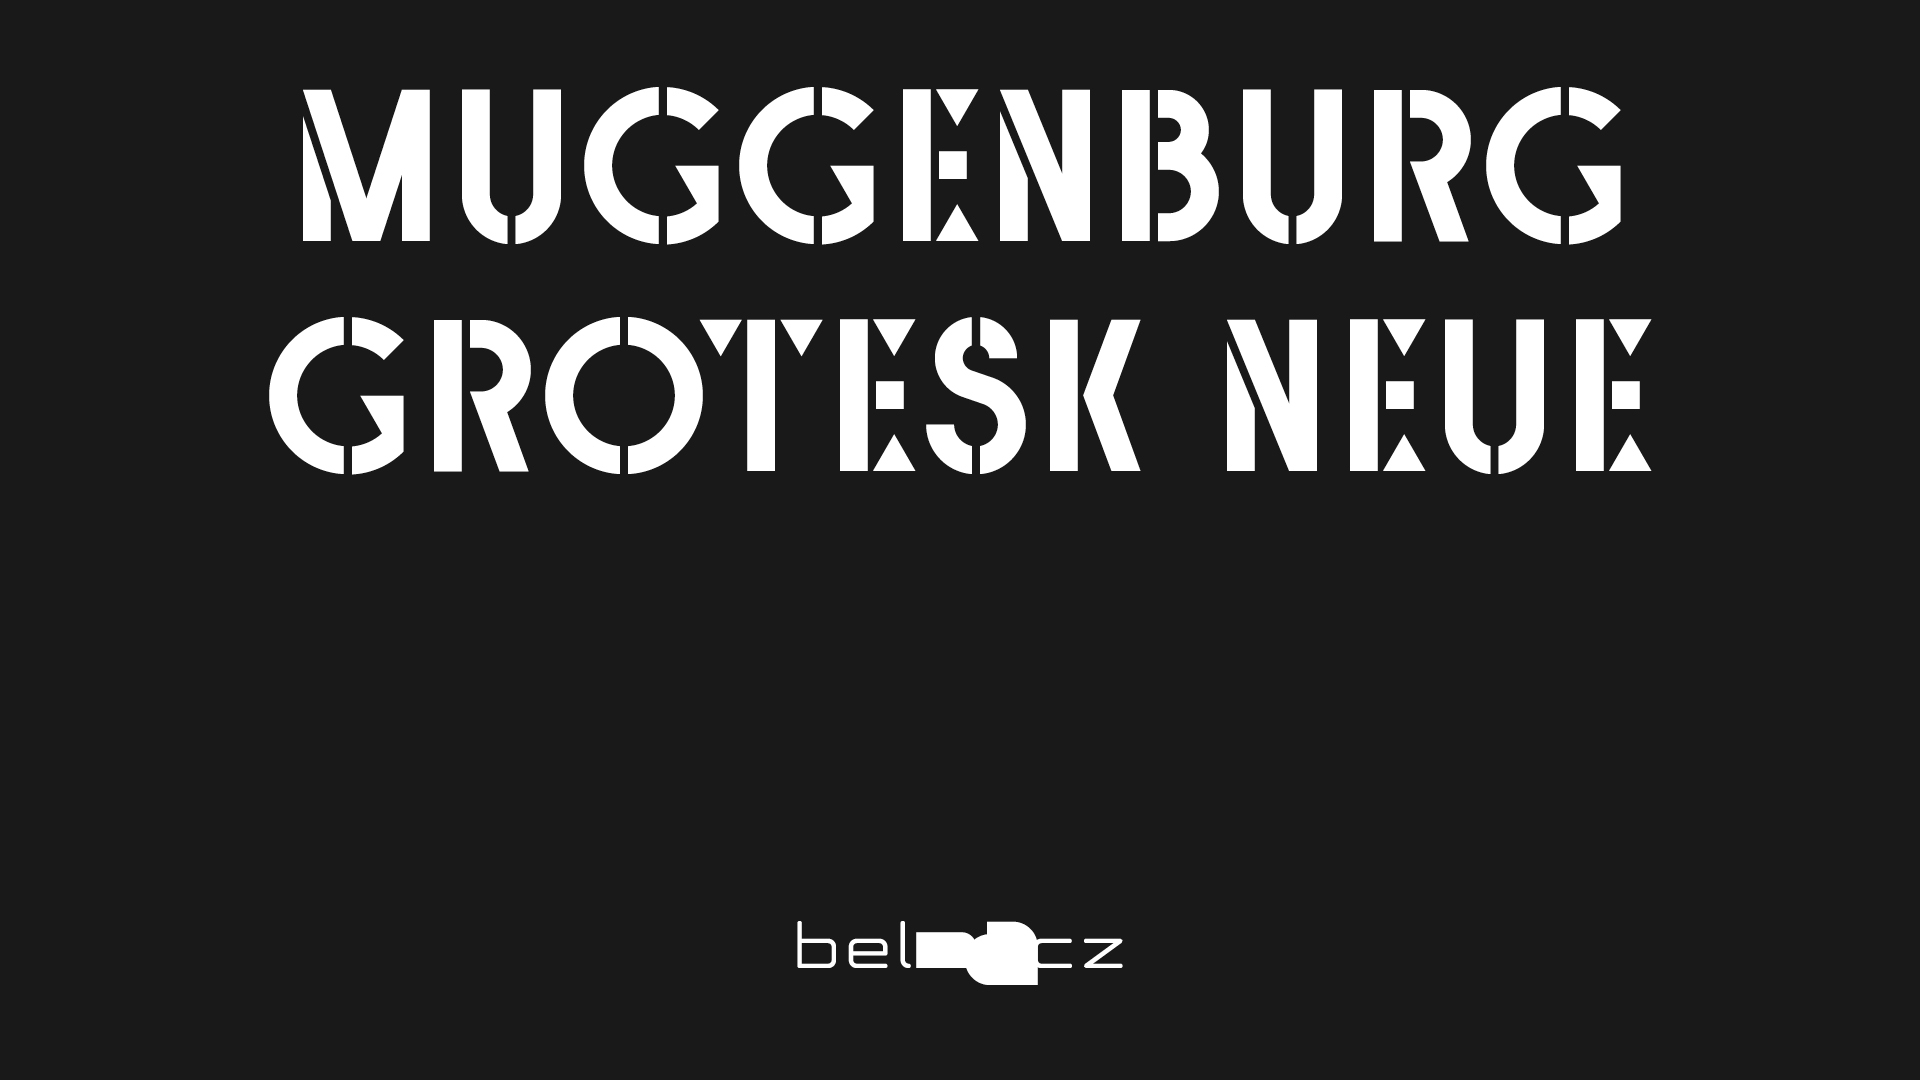 Cover image: Muggenburg Grotesk Neue